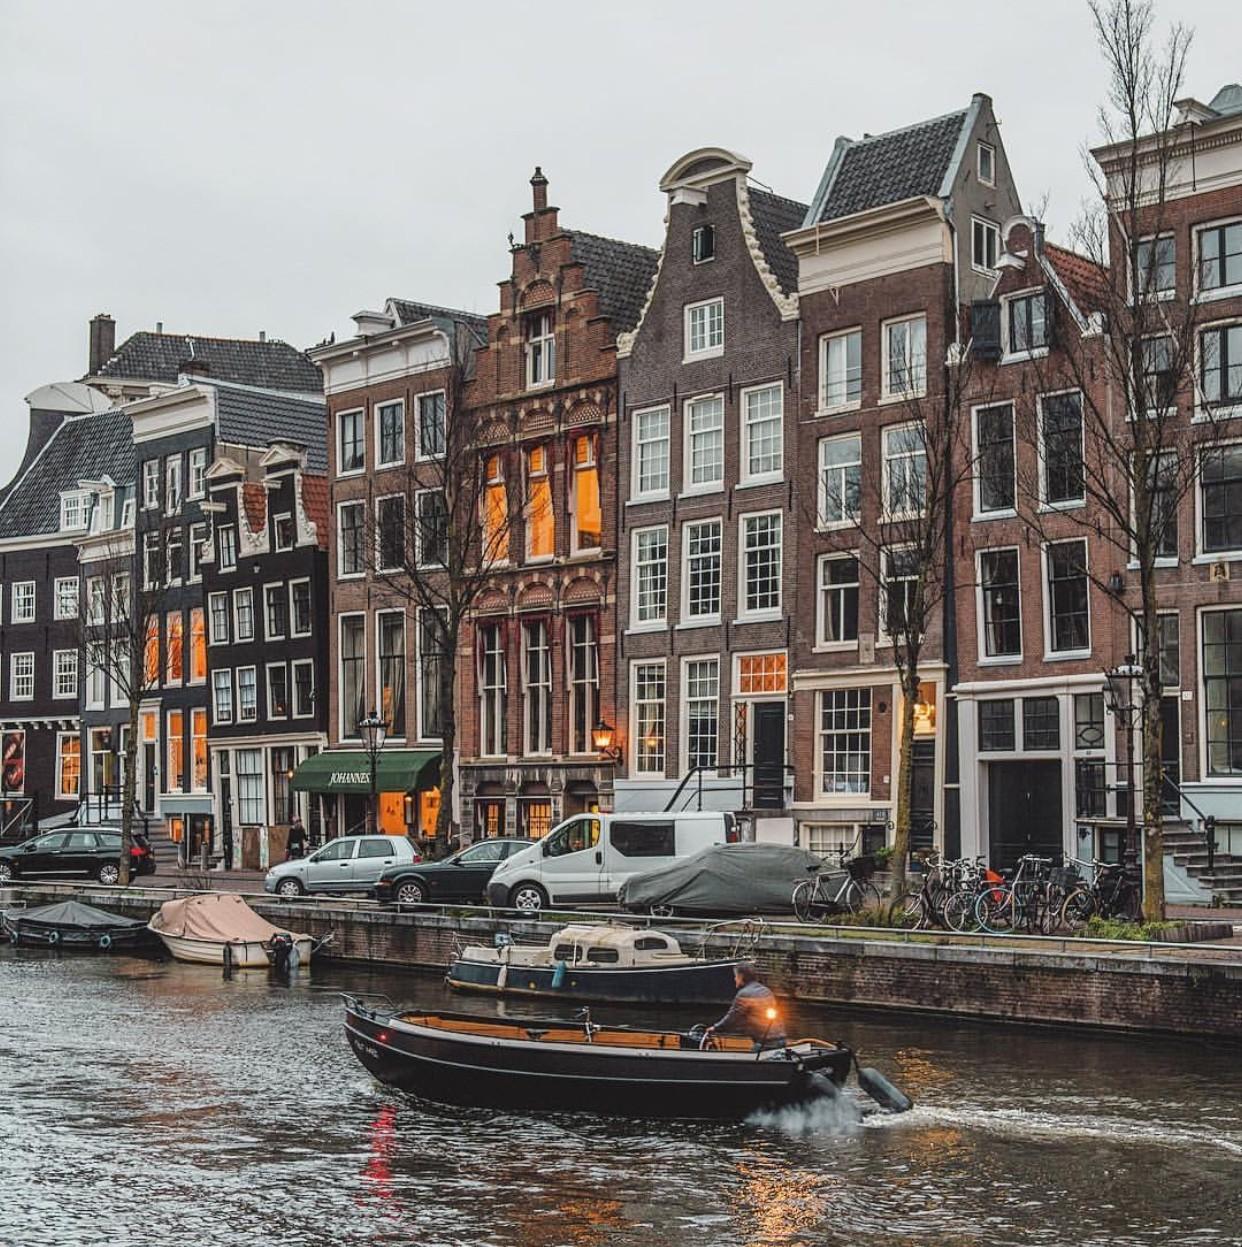 le-dancing-houses-amsterdam-11de2fba87b1